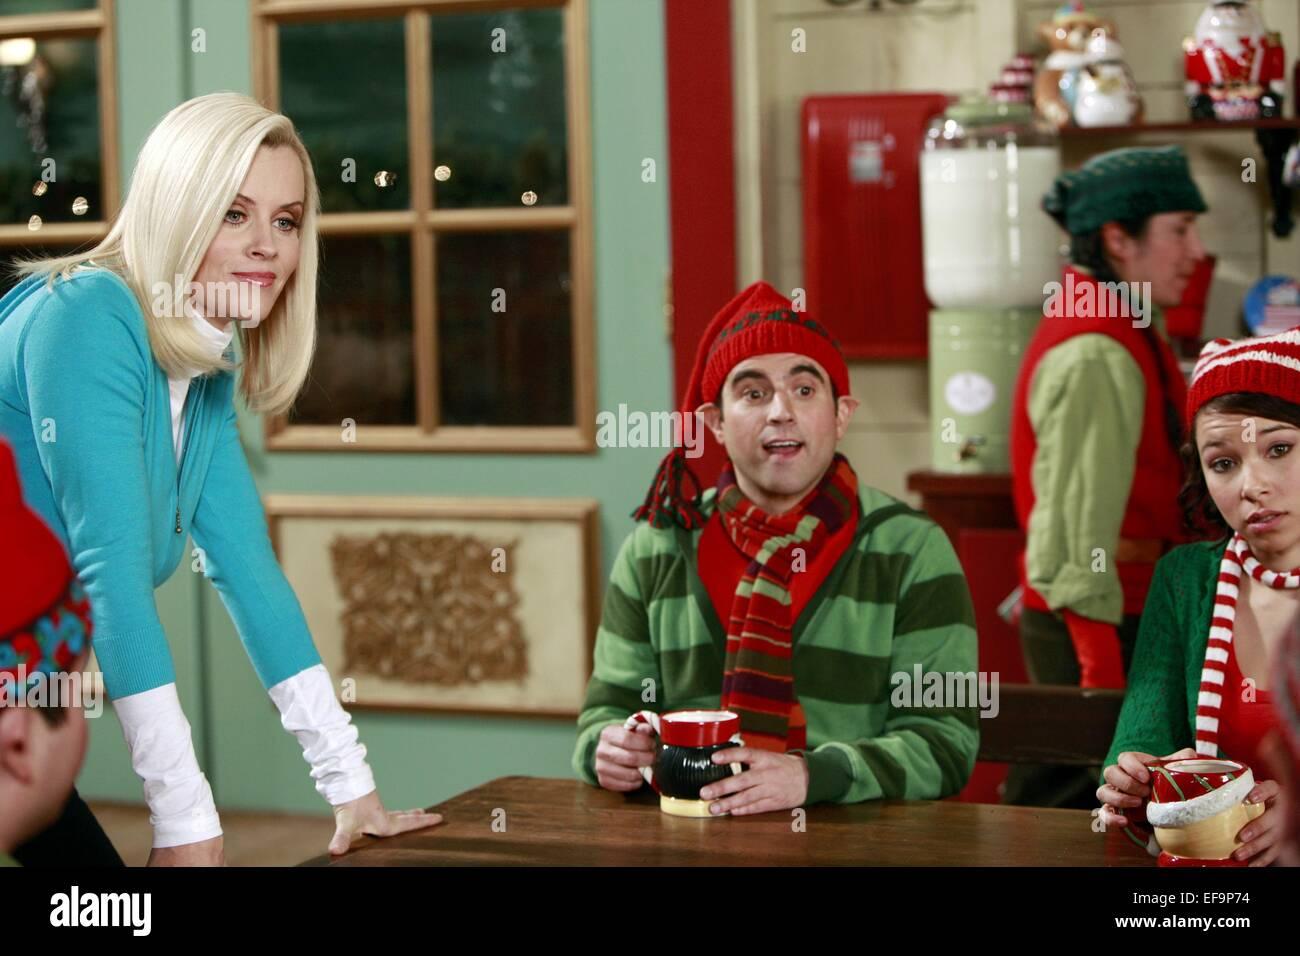 jenny mccarthy gabe khouth santa baby 2 christmas maybe 2009 stock - Santa Baby 2 Christmas Maybe